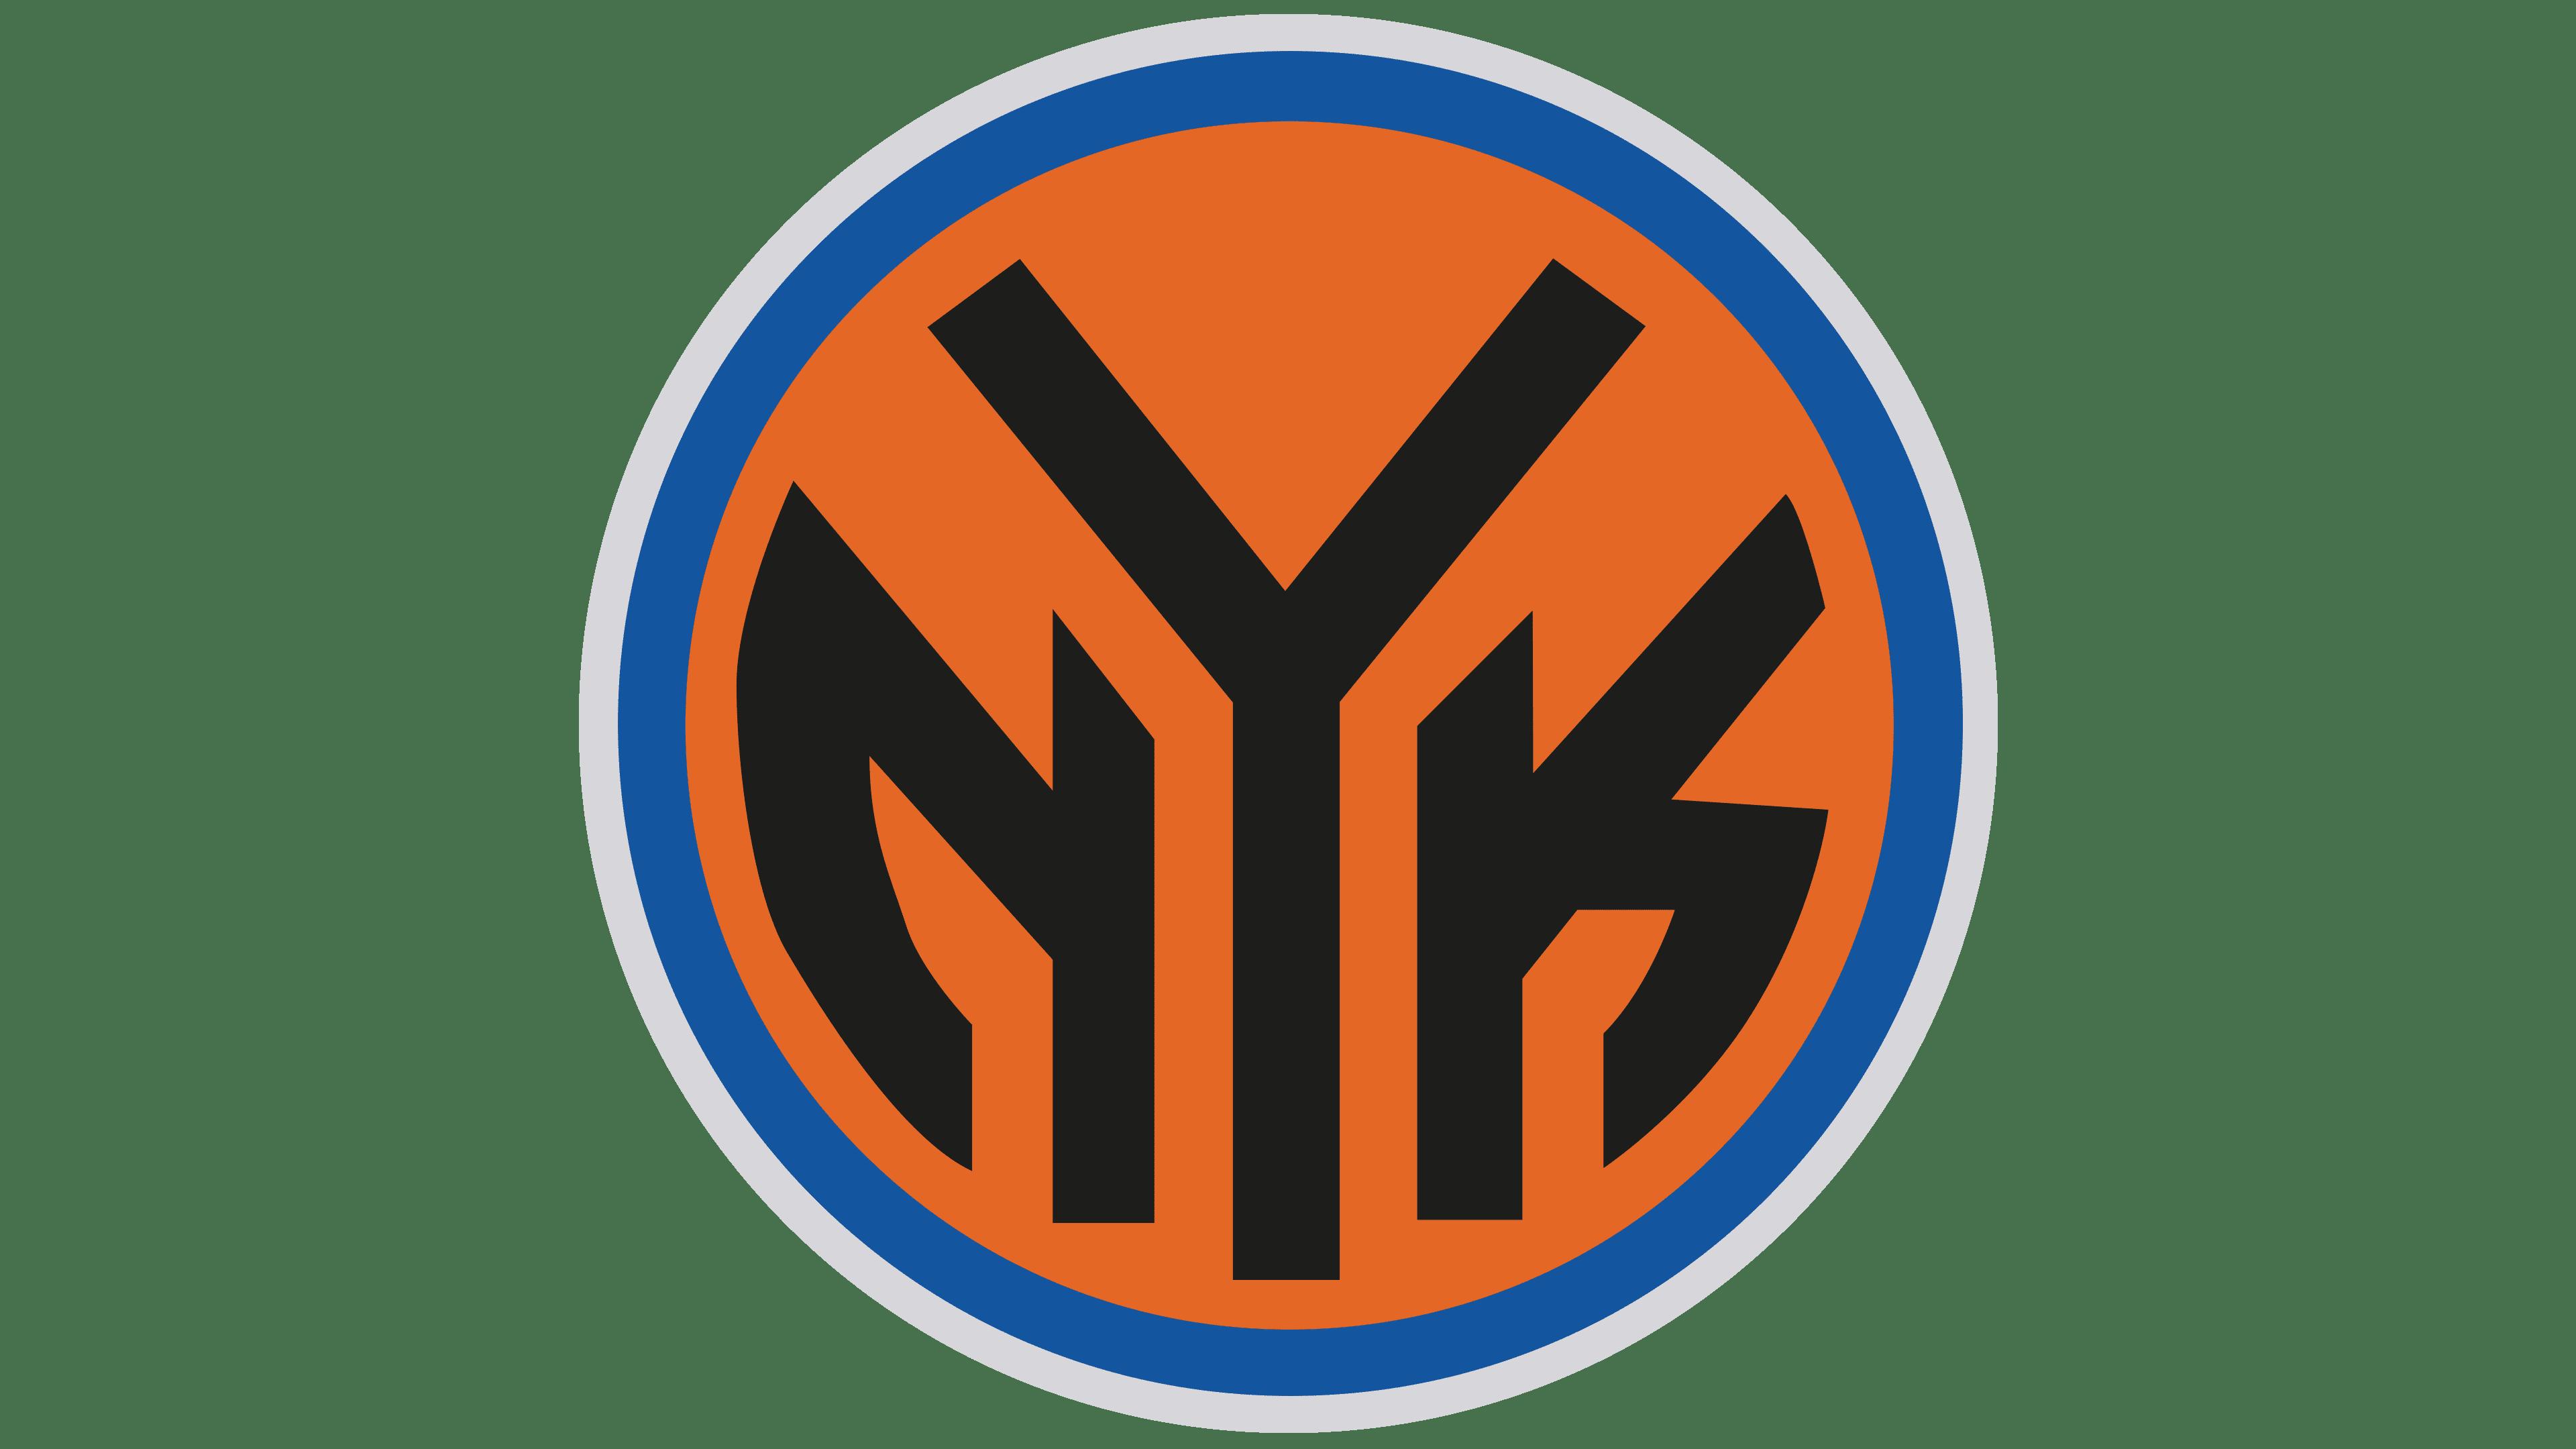 New York Knicks Logo | Symbol, History, PNG (3840*2160)